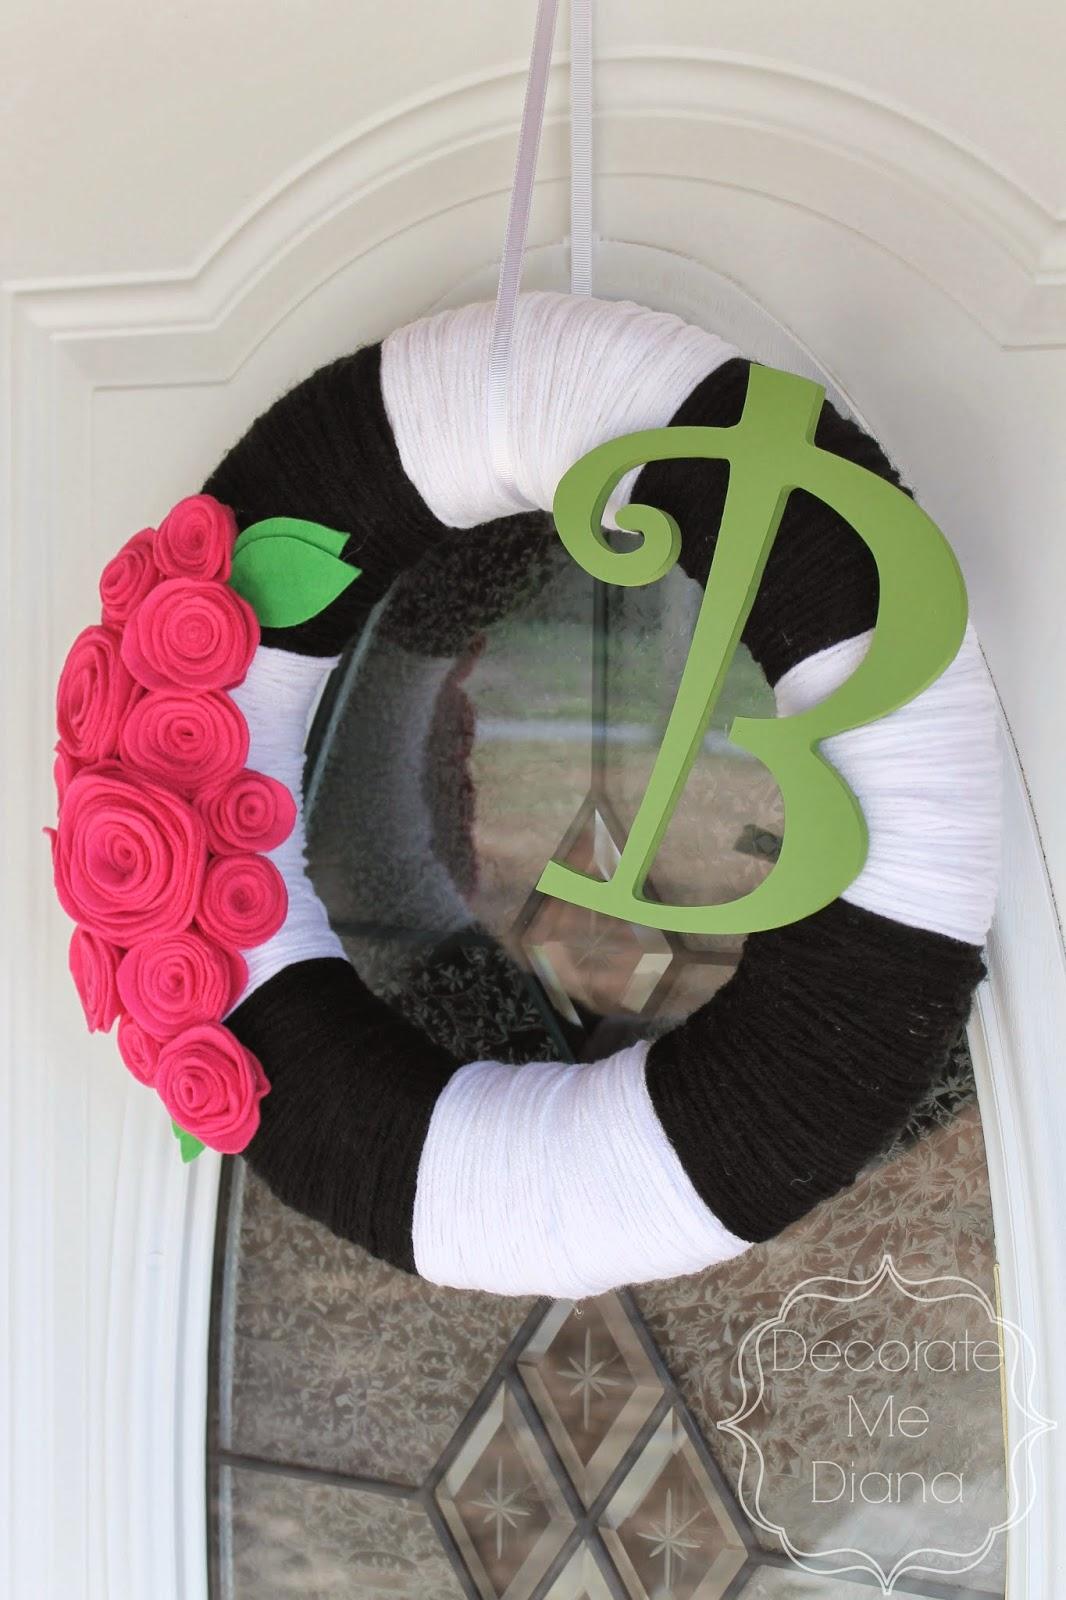 http://www.decoratemediana.com/2014/03/diy-yarn-rosette-wreath.html